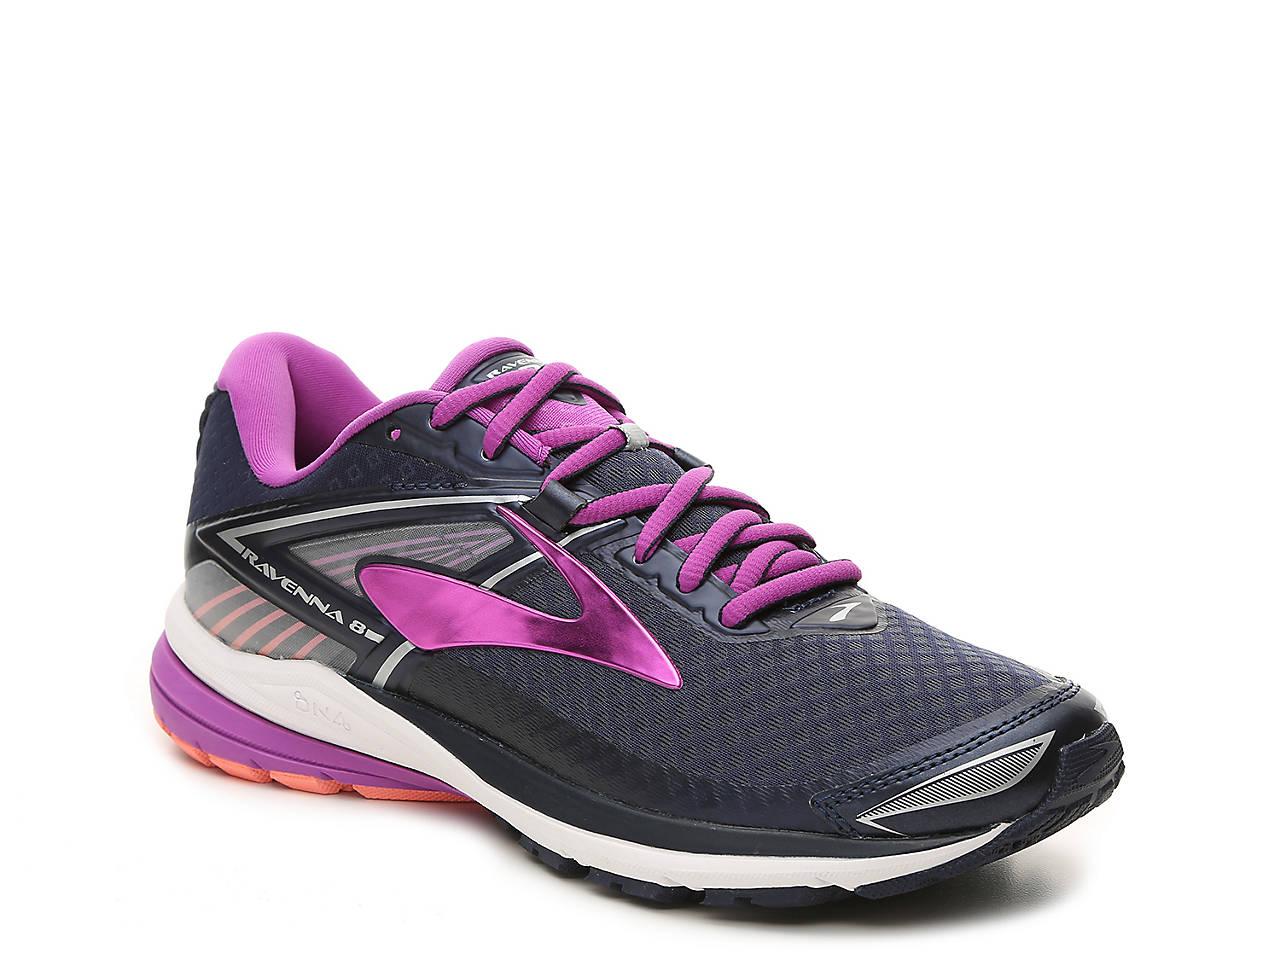 Ravenna 8 Performance Running Shoe - Women's